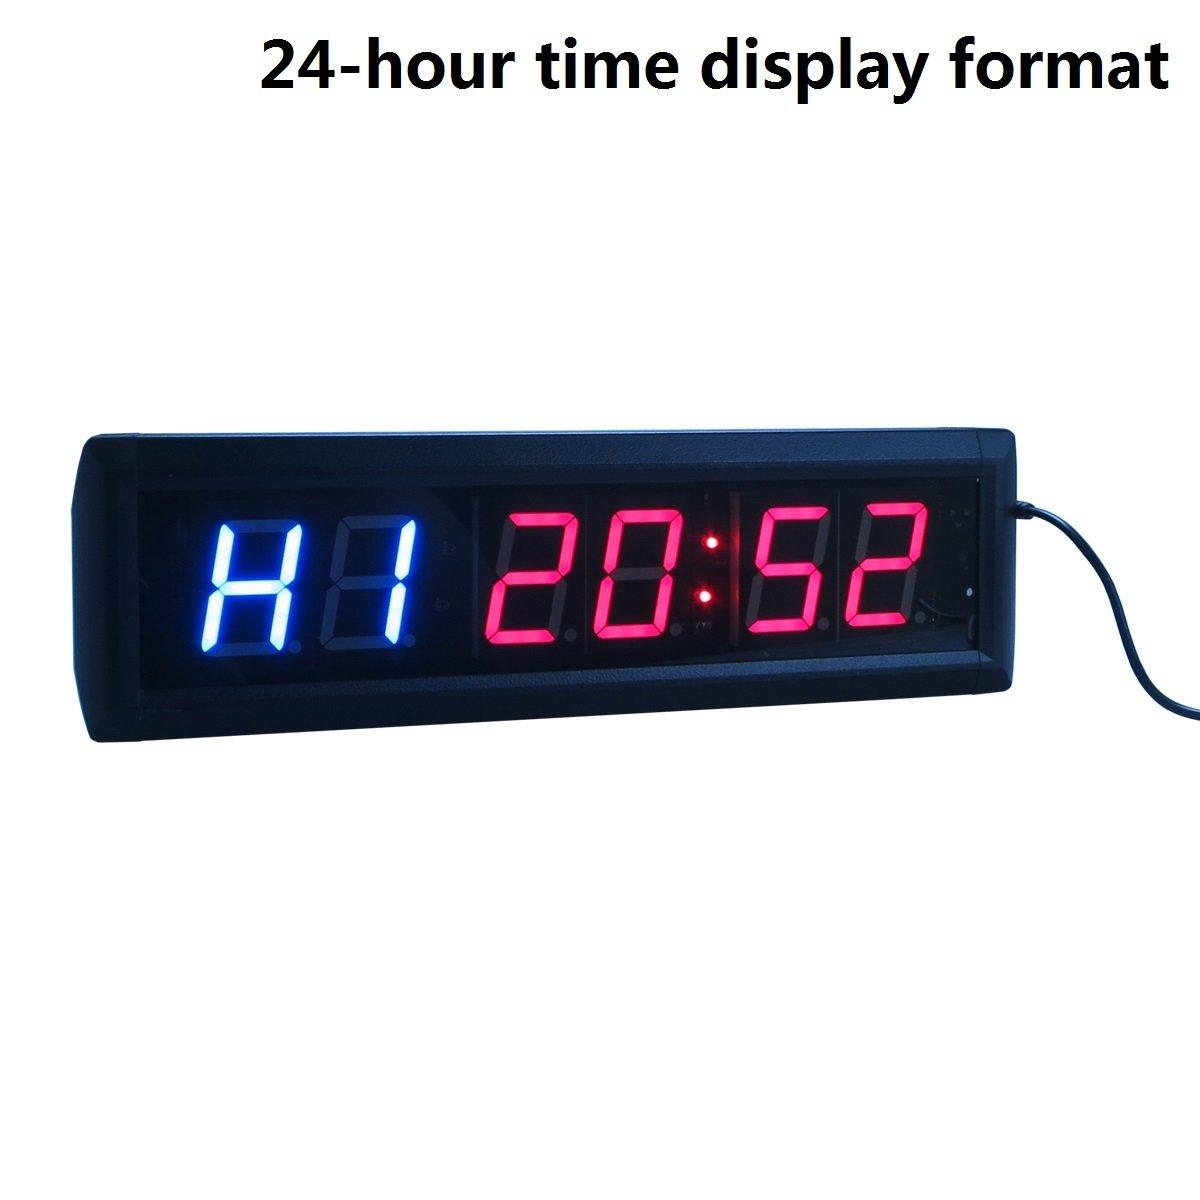 Reloj de pared cronómetro con temporizador de intervalos de Ledgital crossfit con mando a distancia por infrarrojos (35,6 x 10,2 x 3,8 cm), enchufe estándar ...